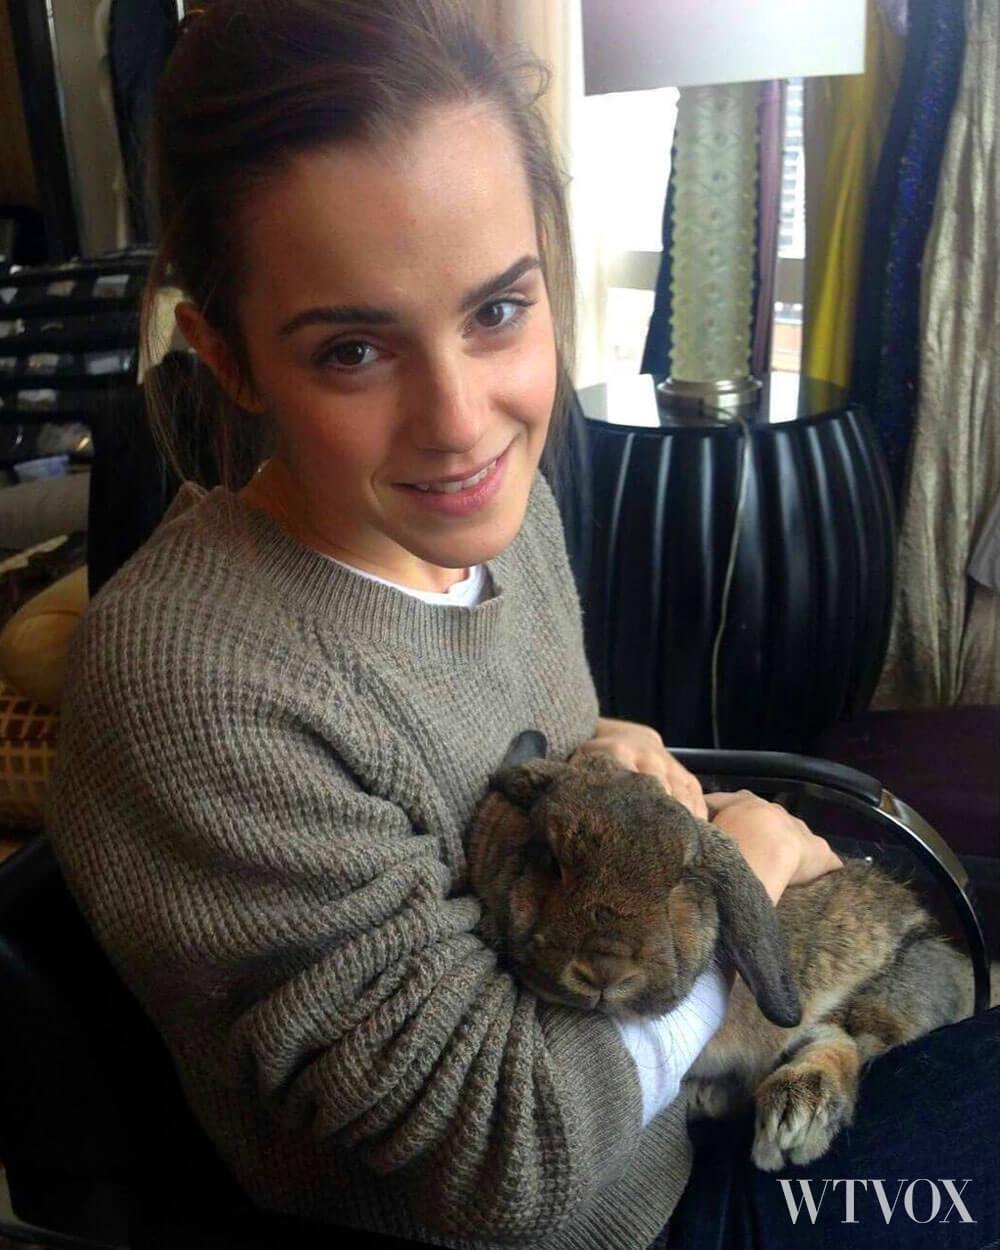 Emma Watson vegan holding animal